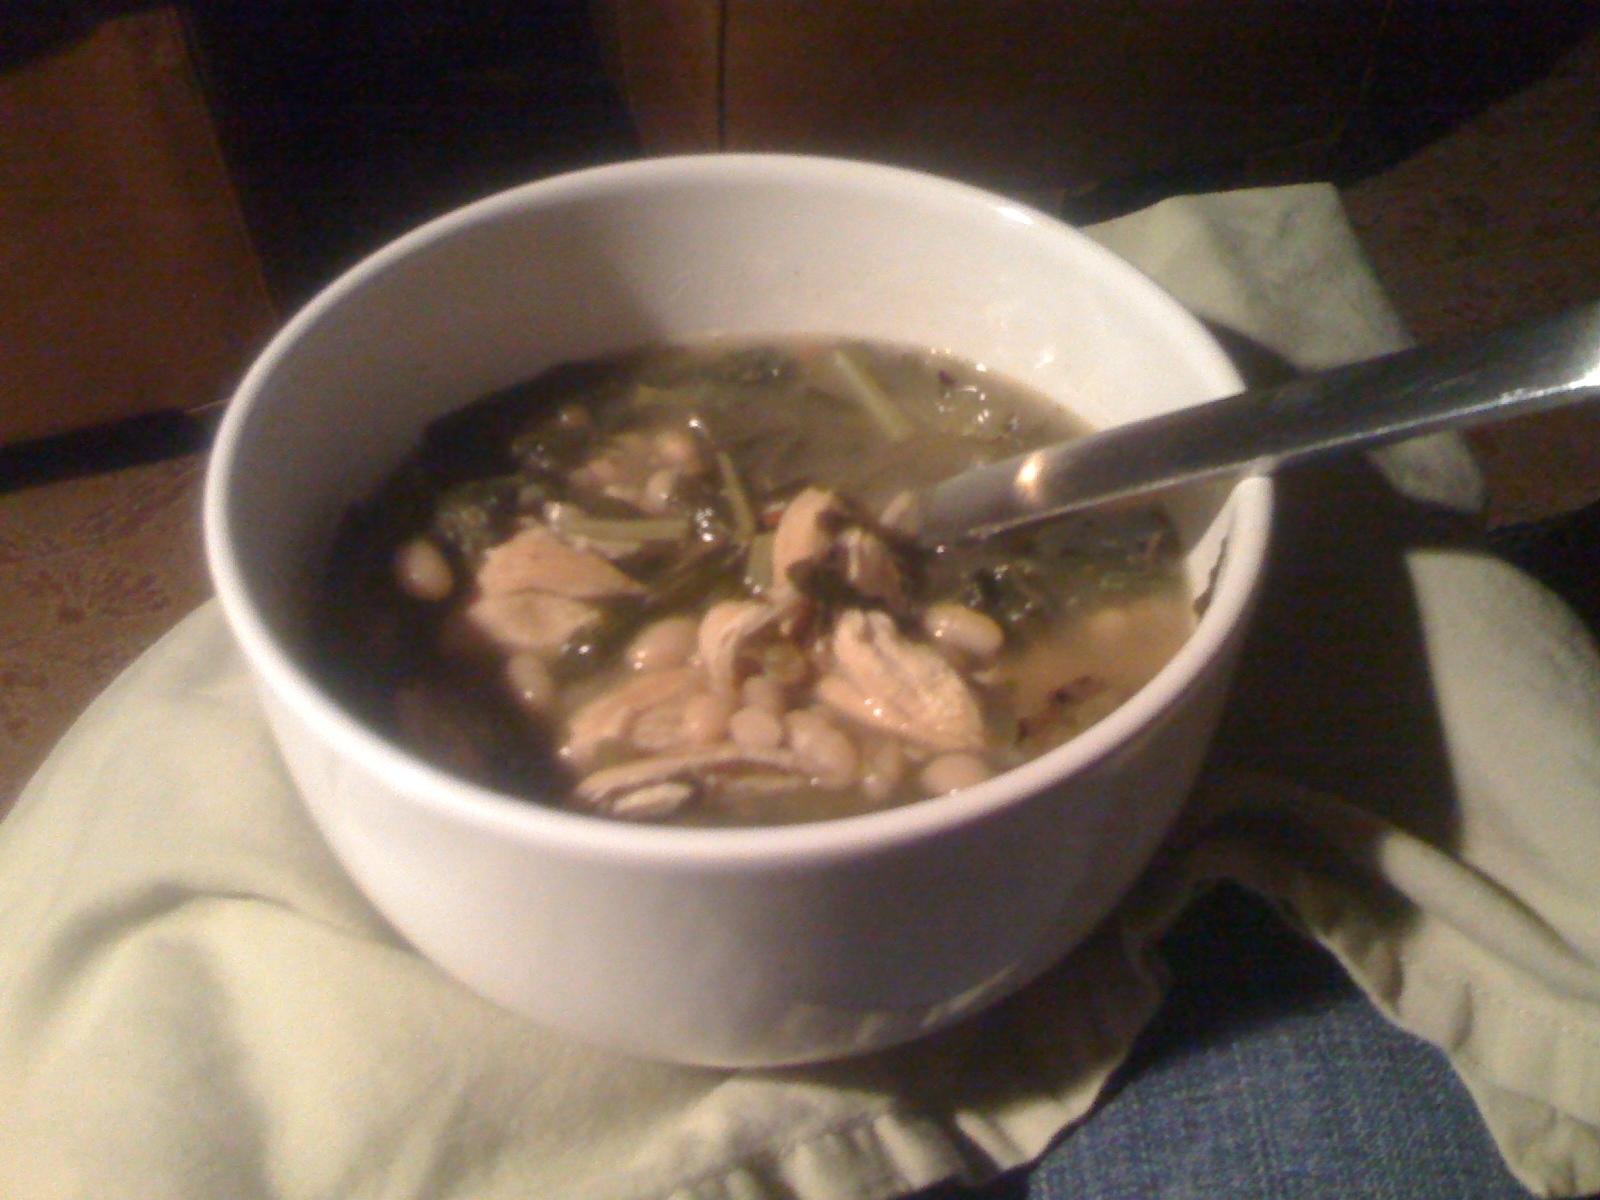 Paula Deen's White Bean Chili with Collard Greens3